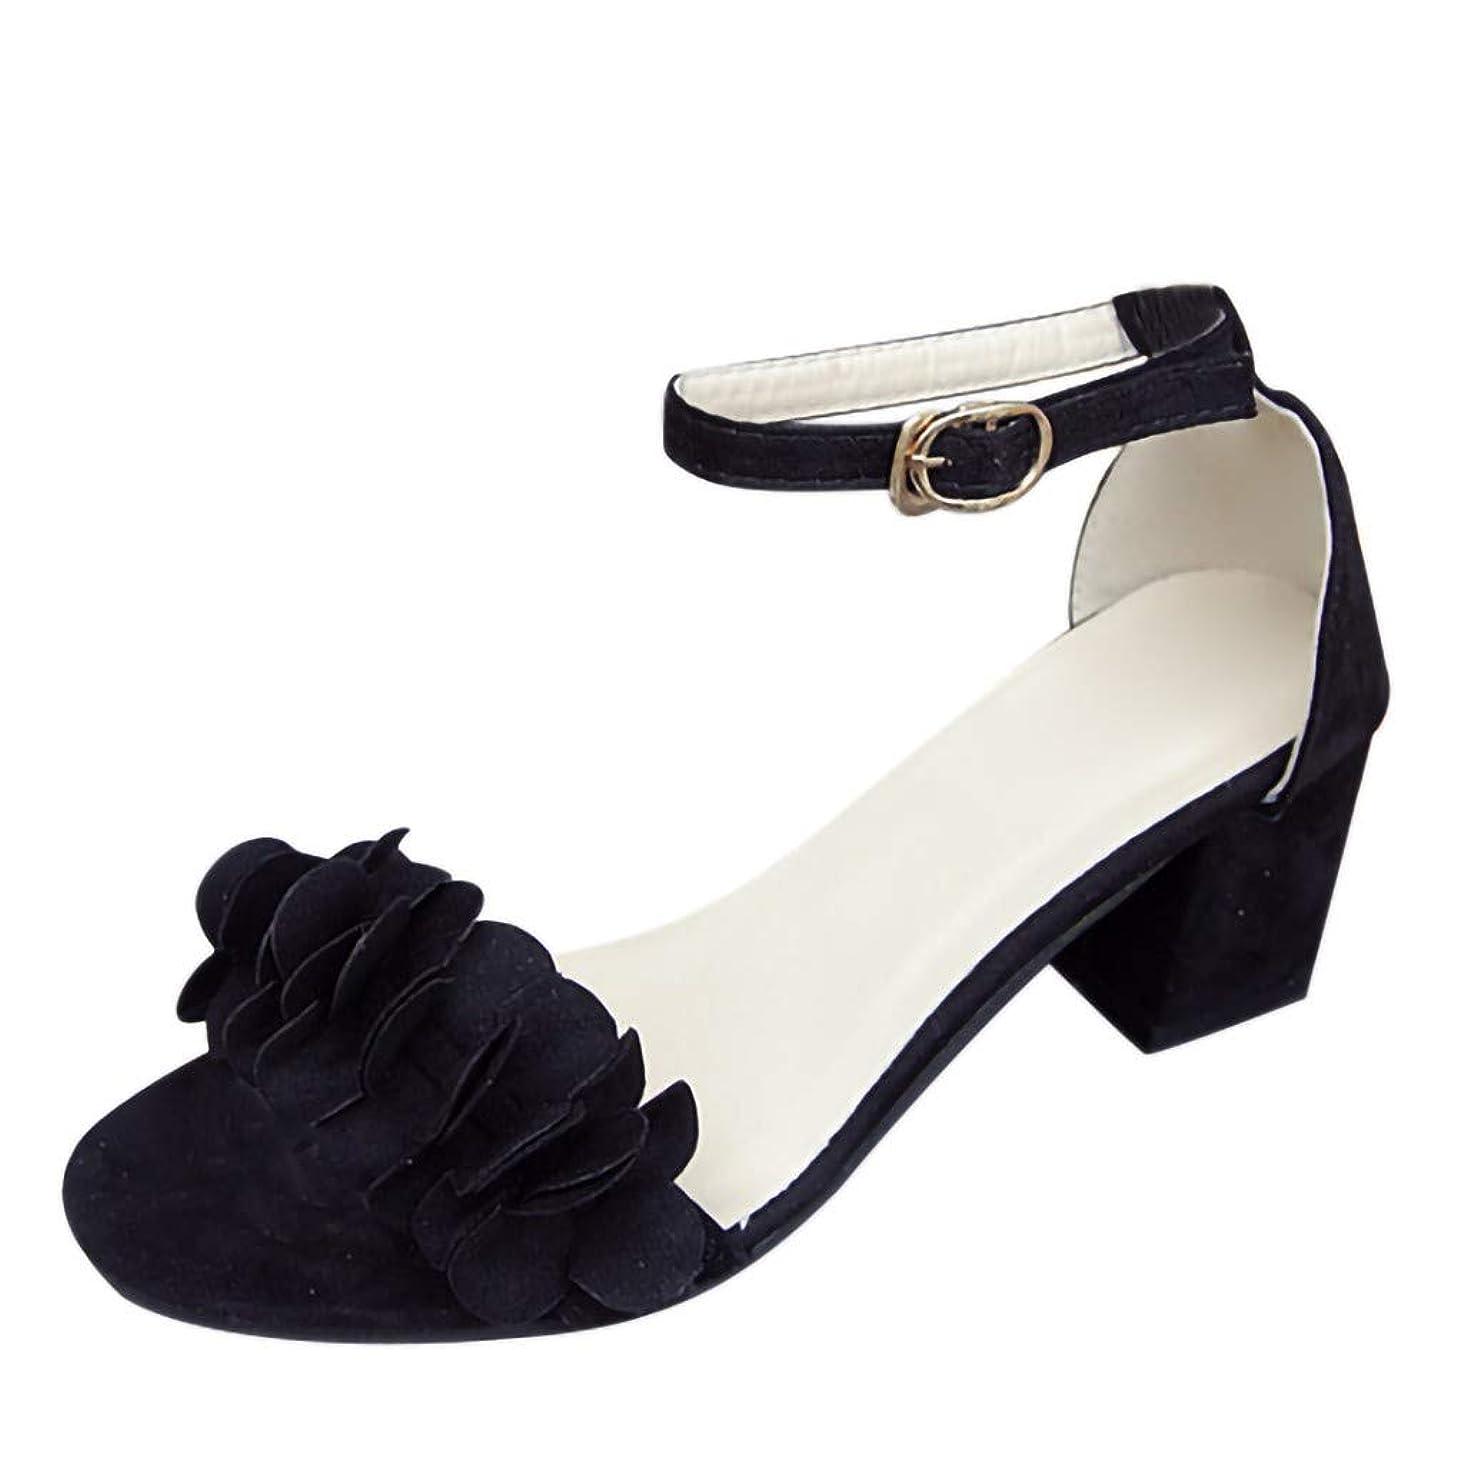 Toimothcn Bridesmaid Shoes, Women's Wedding Sandals Classic Single Band Chunky Block Heel Ankle Strap Pump